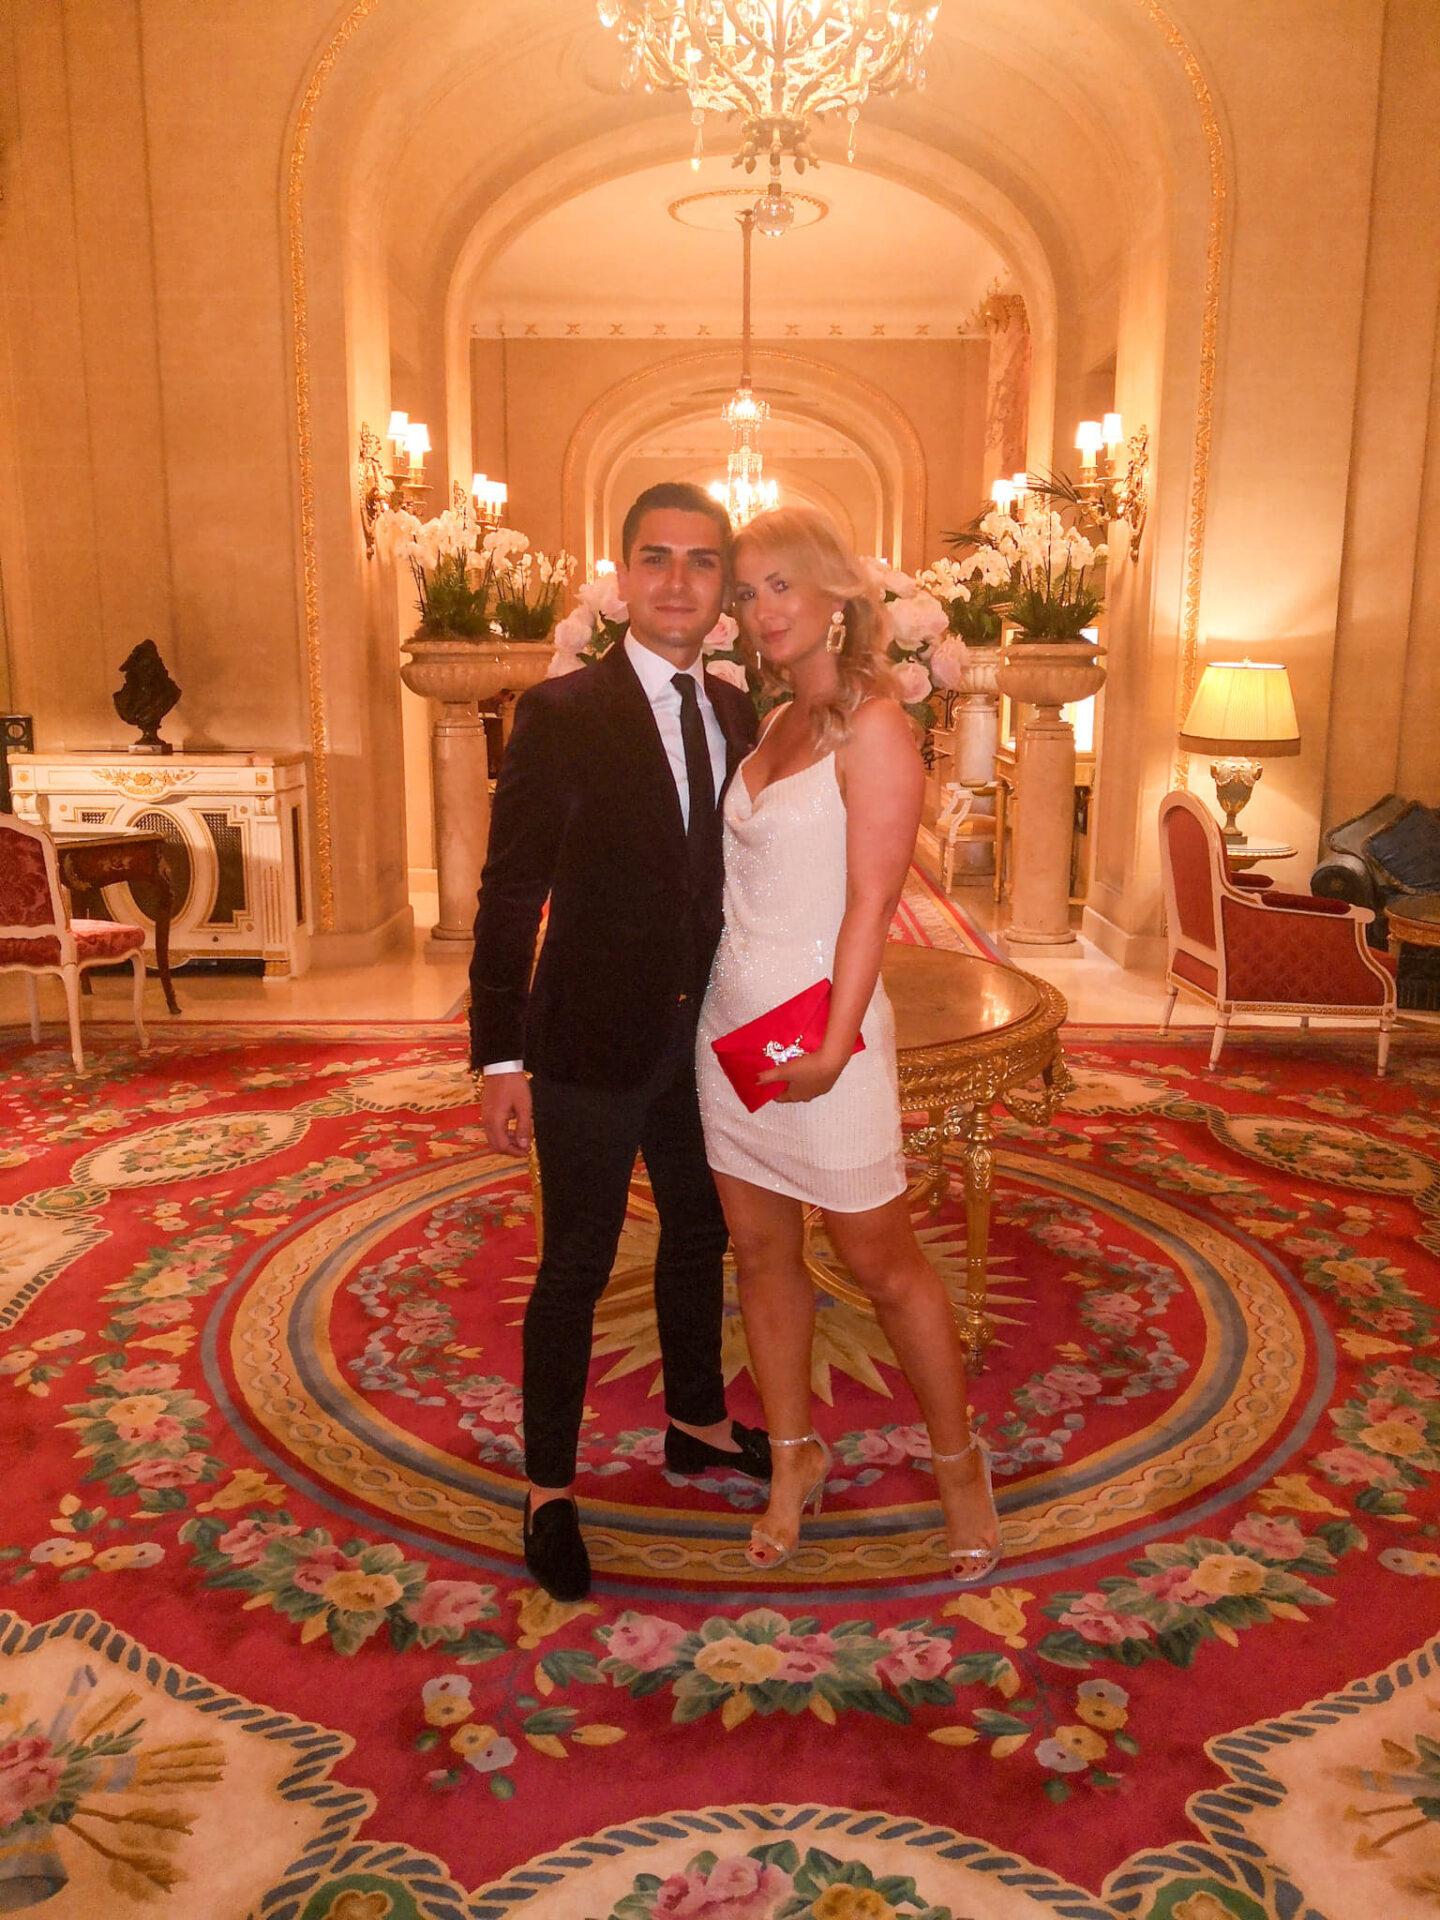 First Wedding Anniversary Dinner at The Ritz Restaurant in London